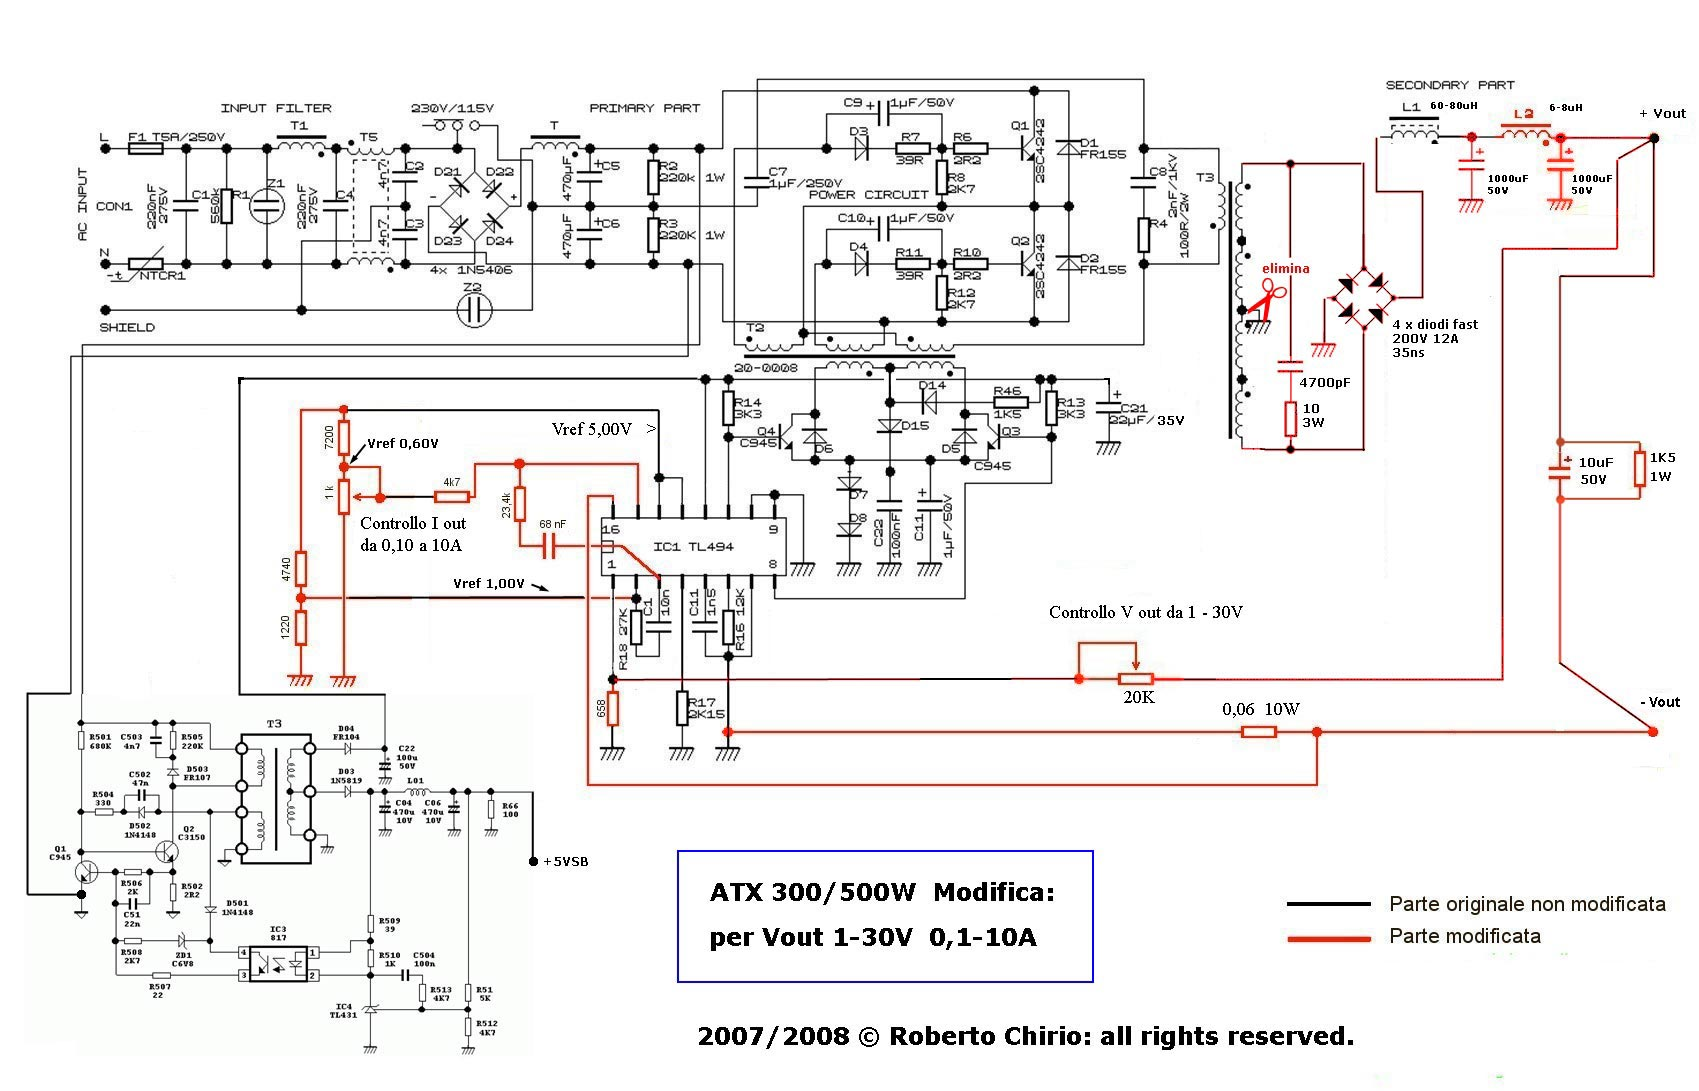 KA7500B.  Был взят рабочий блок питания ATX CODEGEN 300W.  ШИМ контроллер.  TL494) .